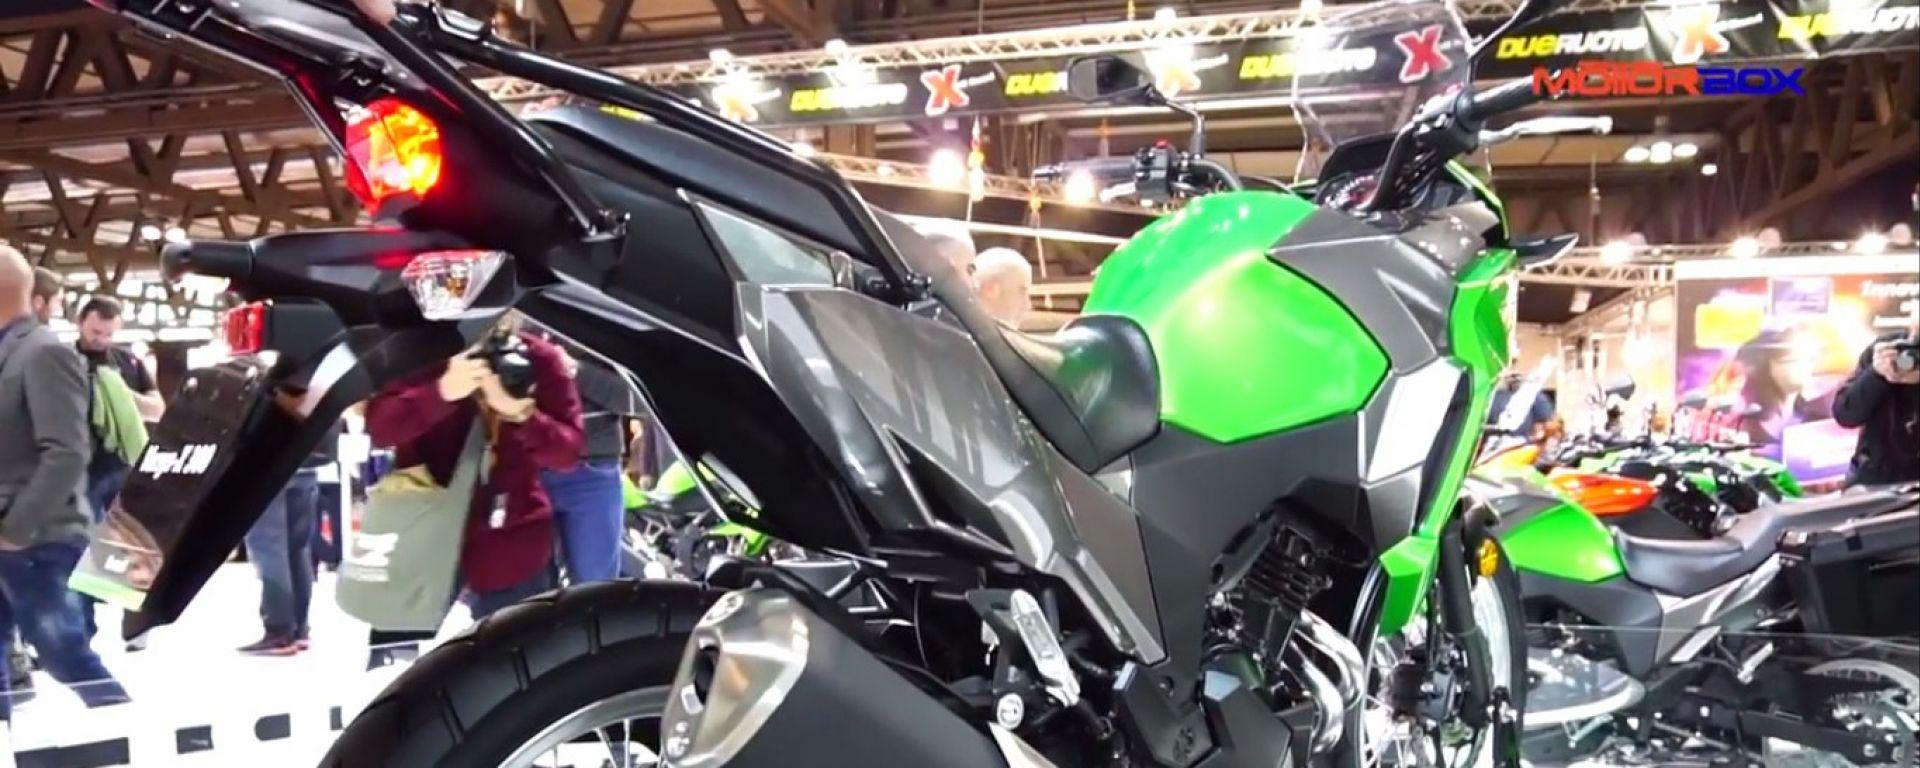 Live Eicma 2016: Kawasaki Versys-X 300 in video